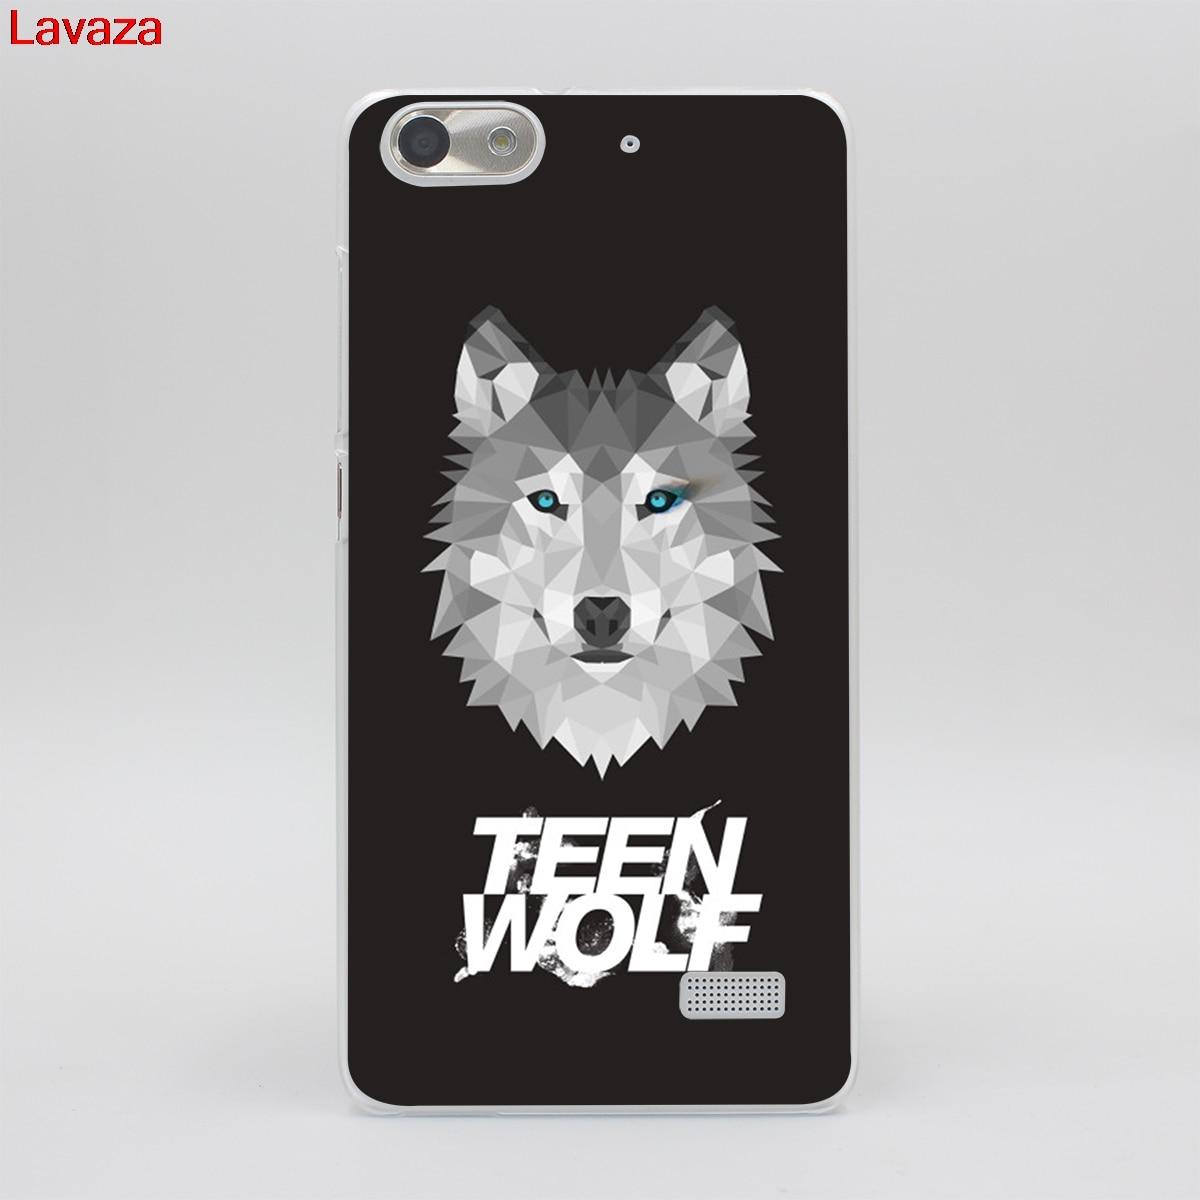 Lavaza Coque teen wolf Hard Phone Case for Huawei P10 P8 P9 Lite ( 2015 2016 2017 ) Plus Honor 9 Lite